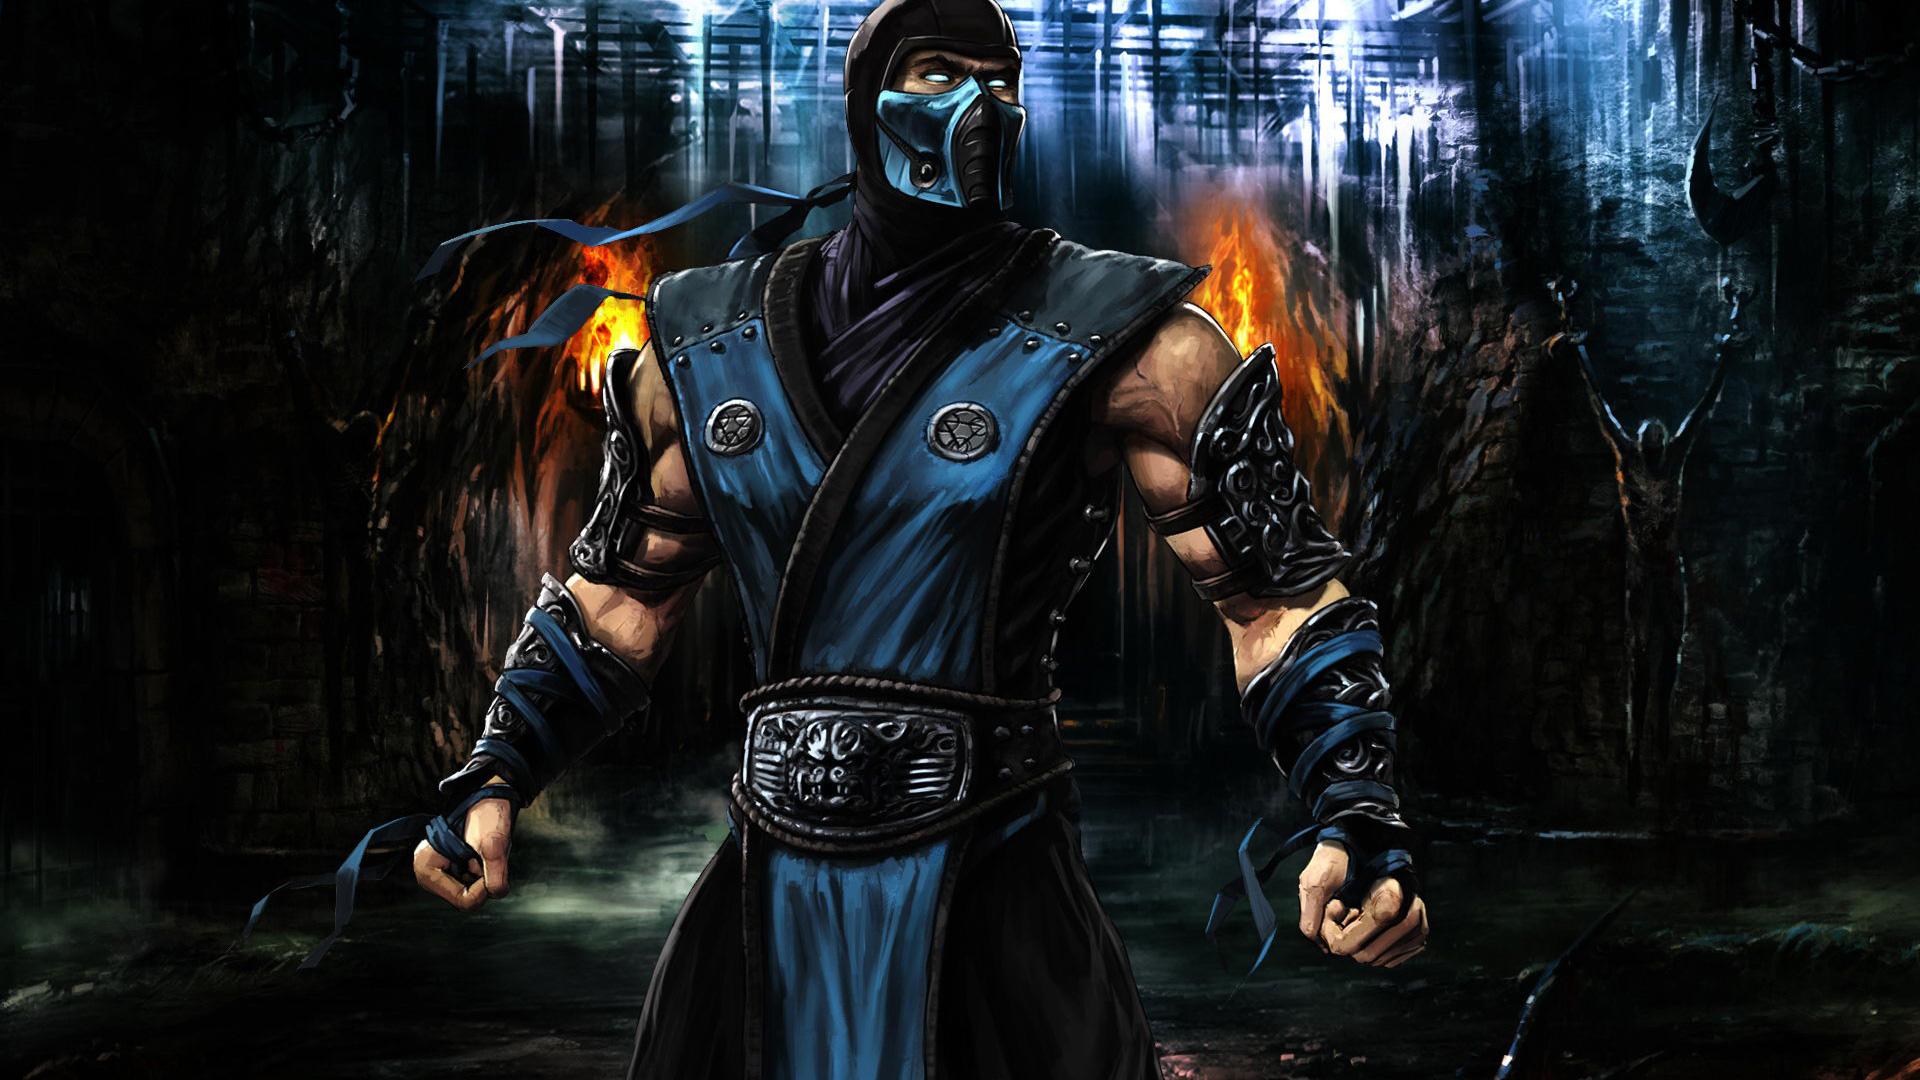 Mortal Kombat 11 Ultimate Review - The Definitive Final